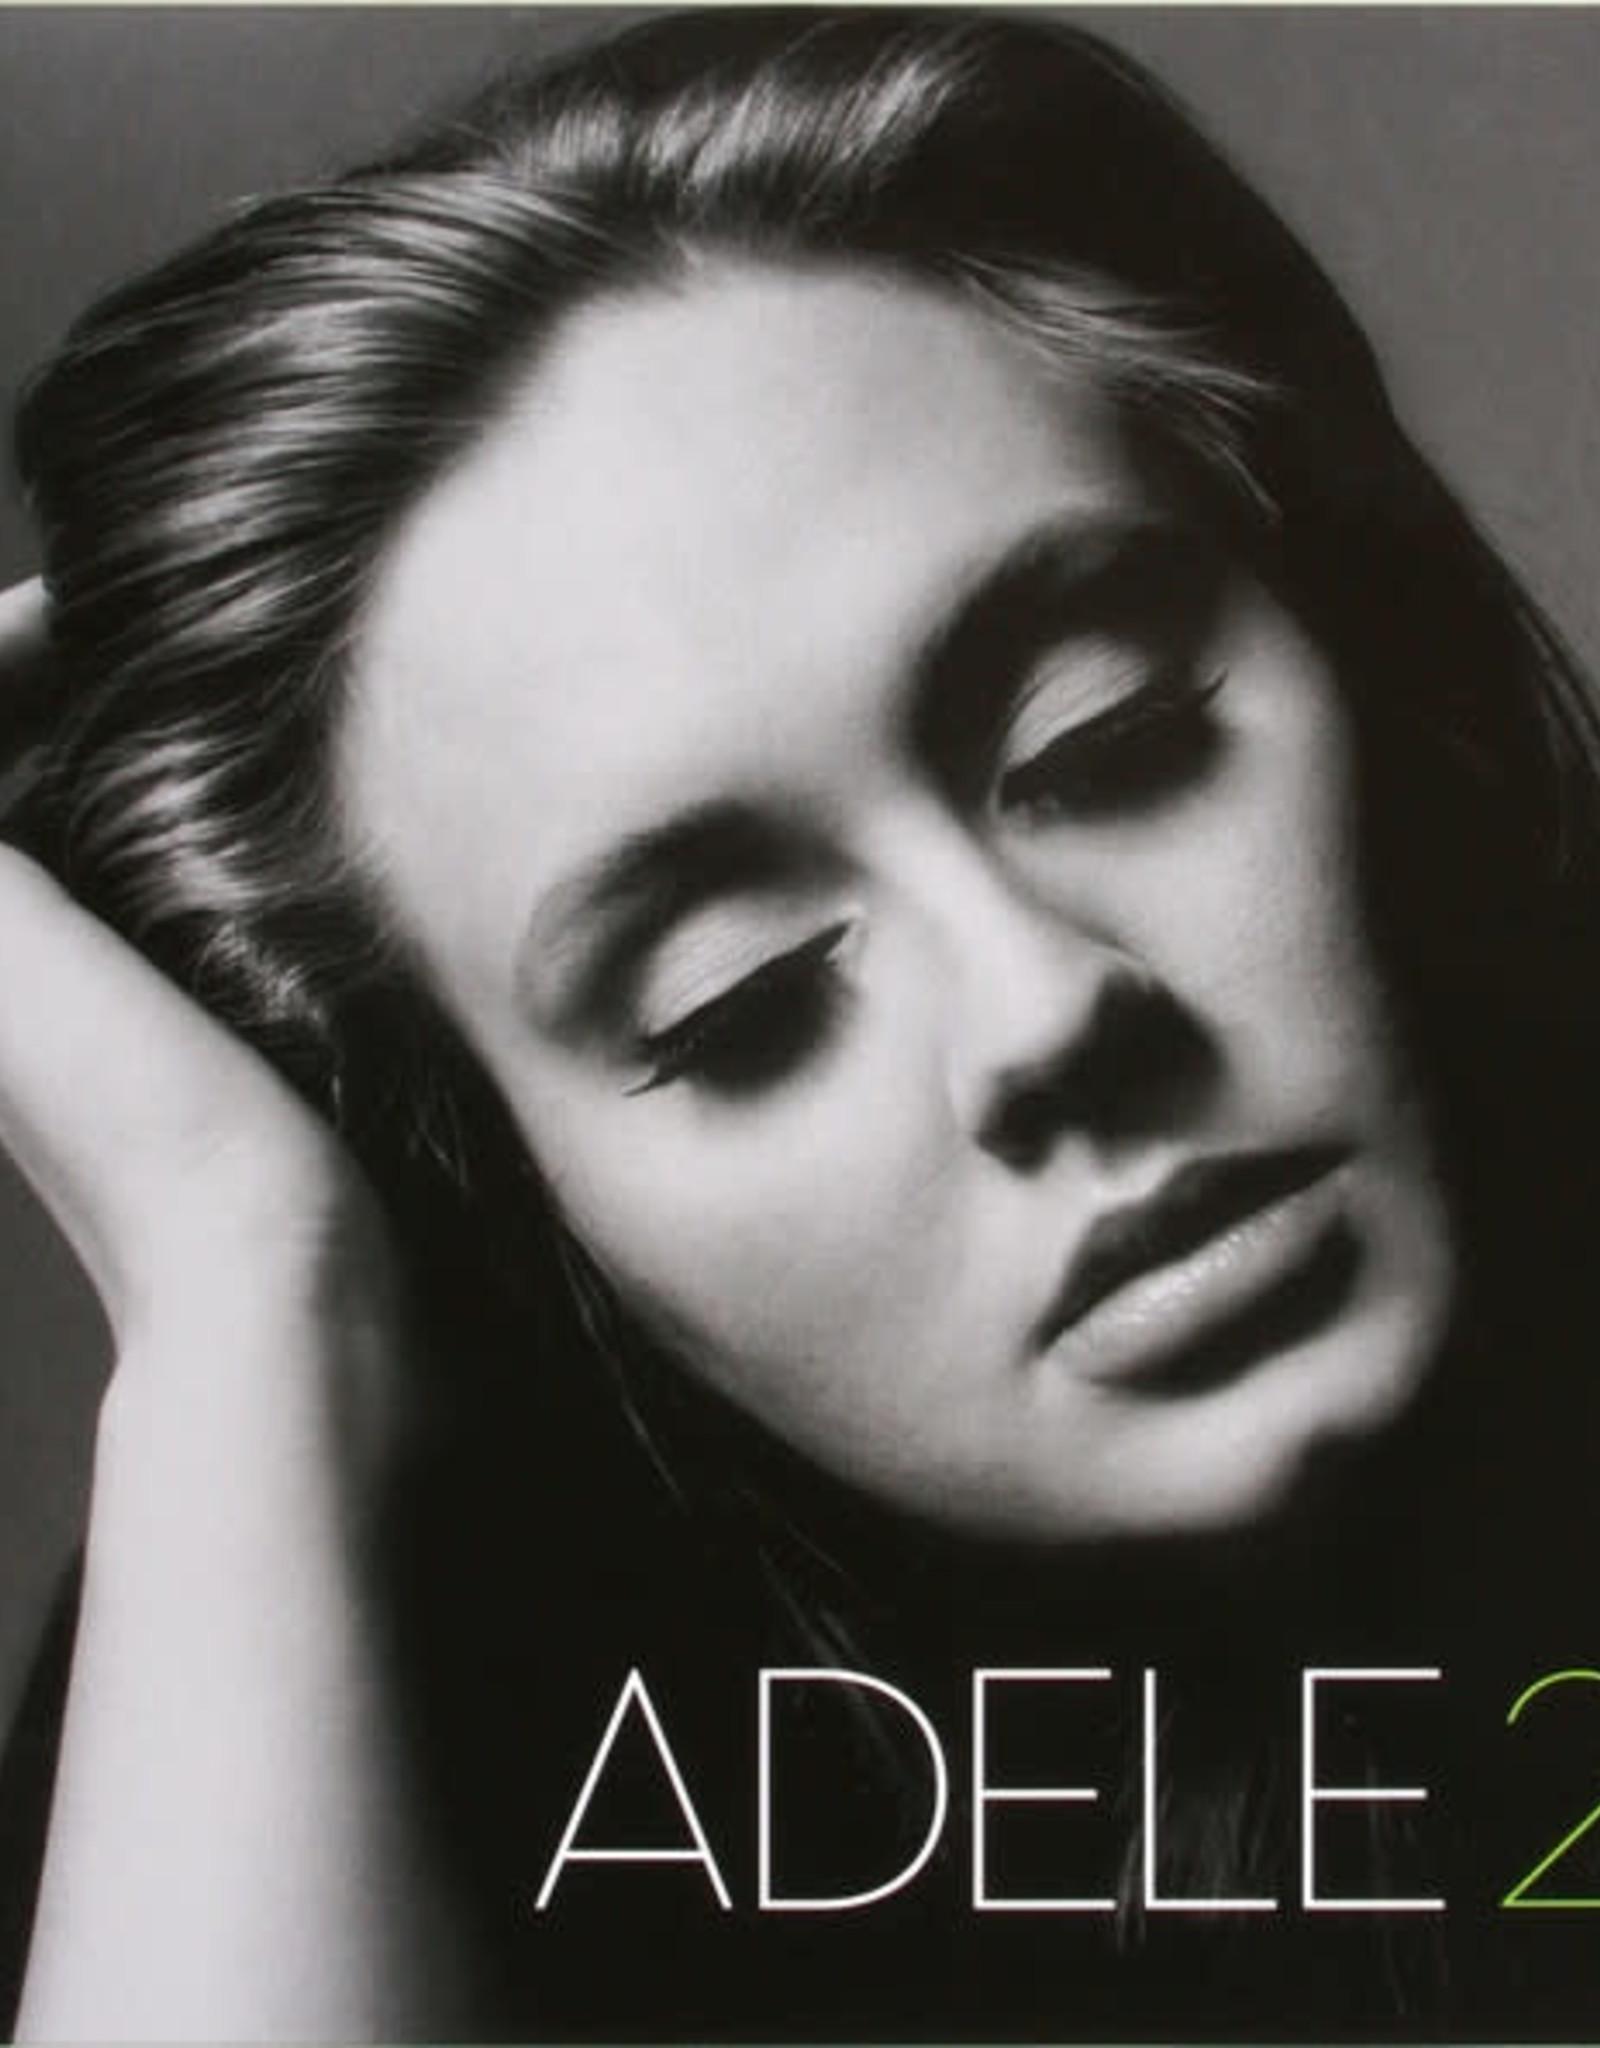 Adele / 21